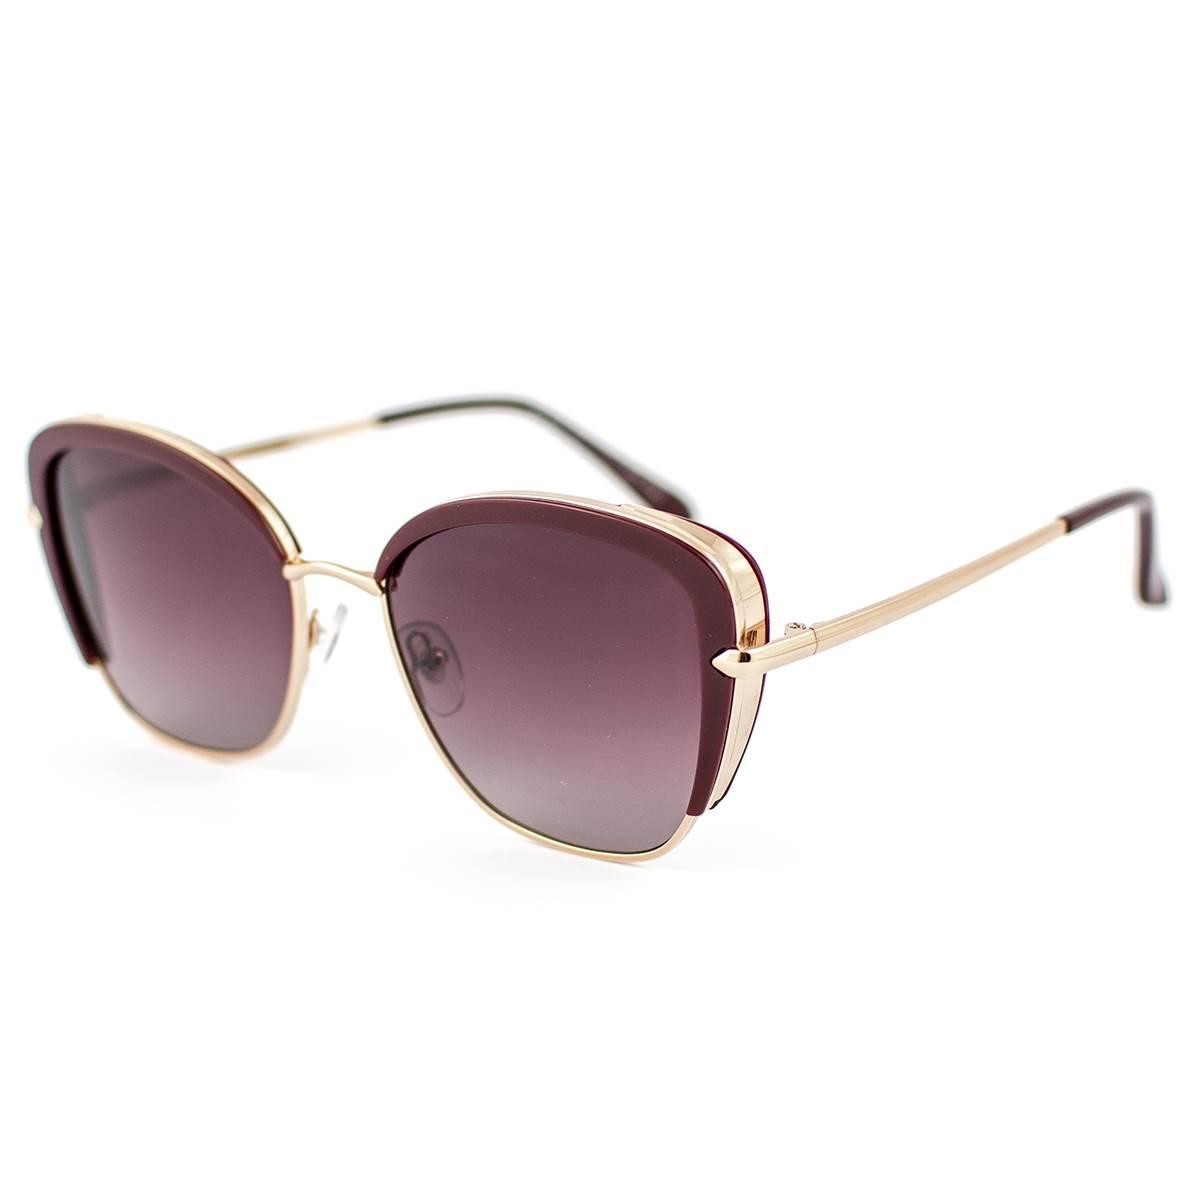 Naočare za sunce Eternal C81